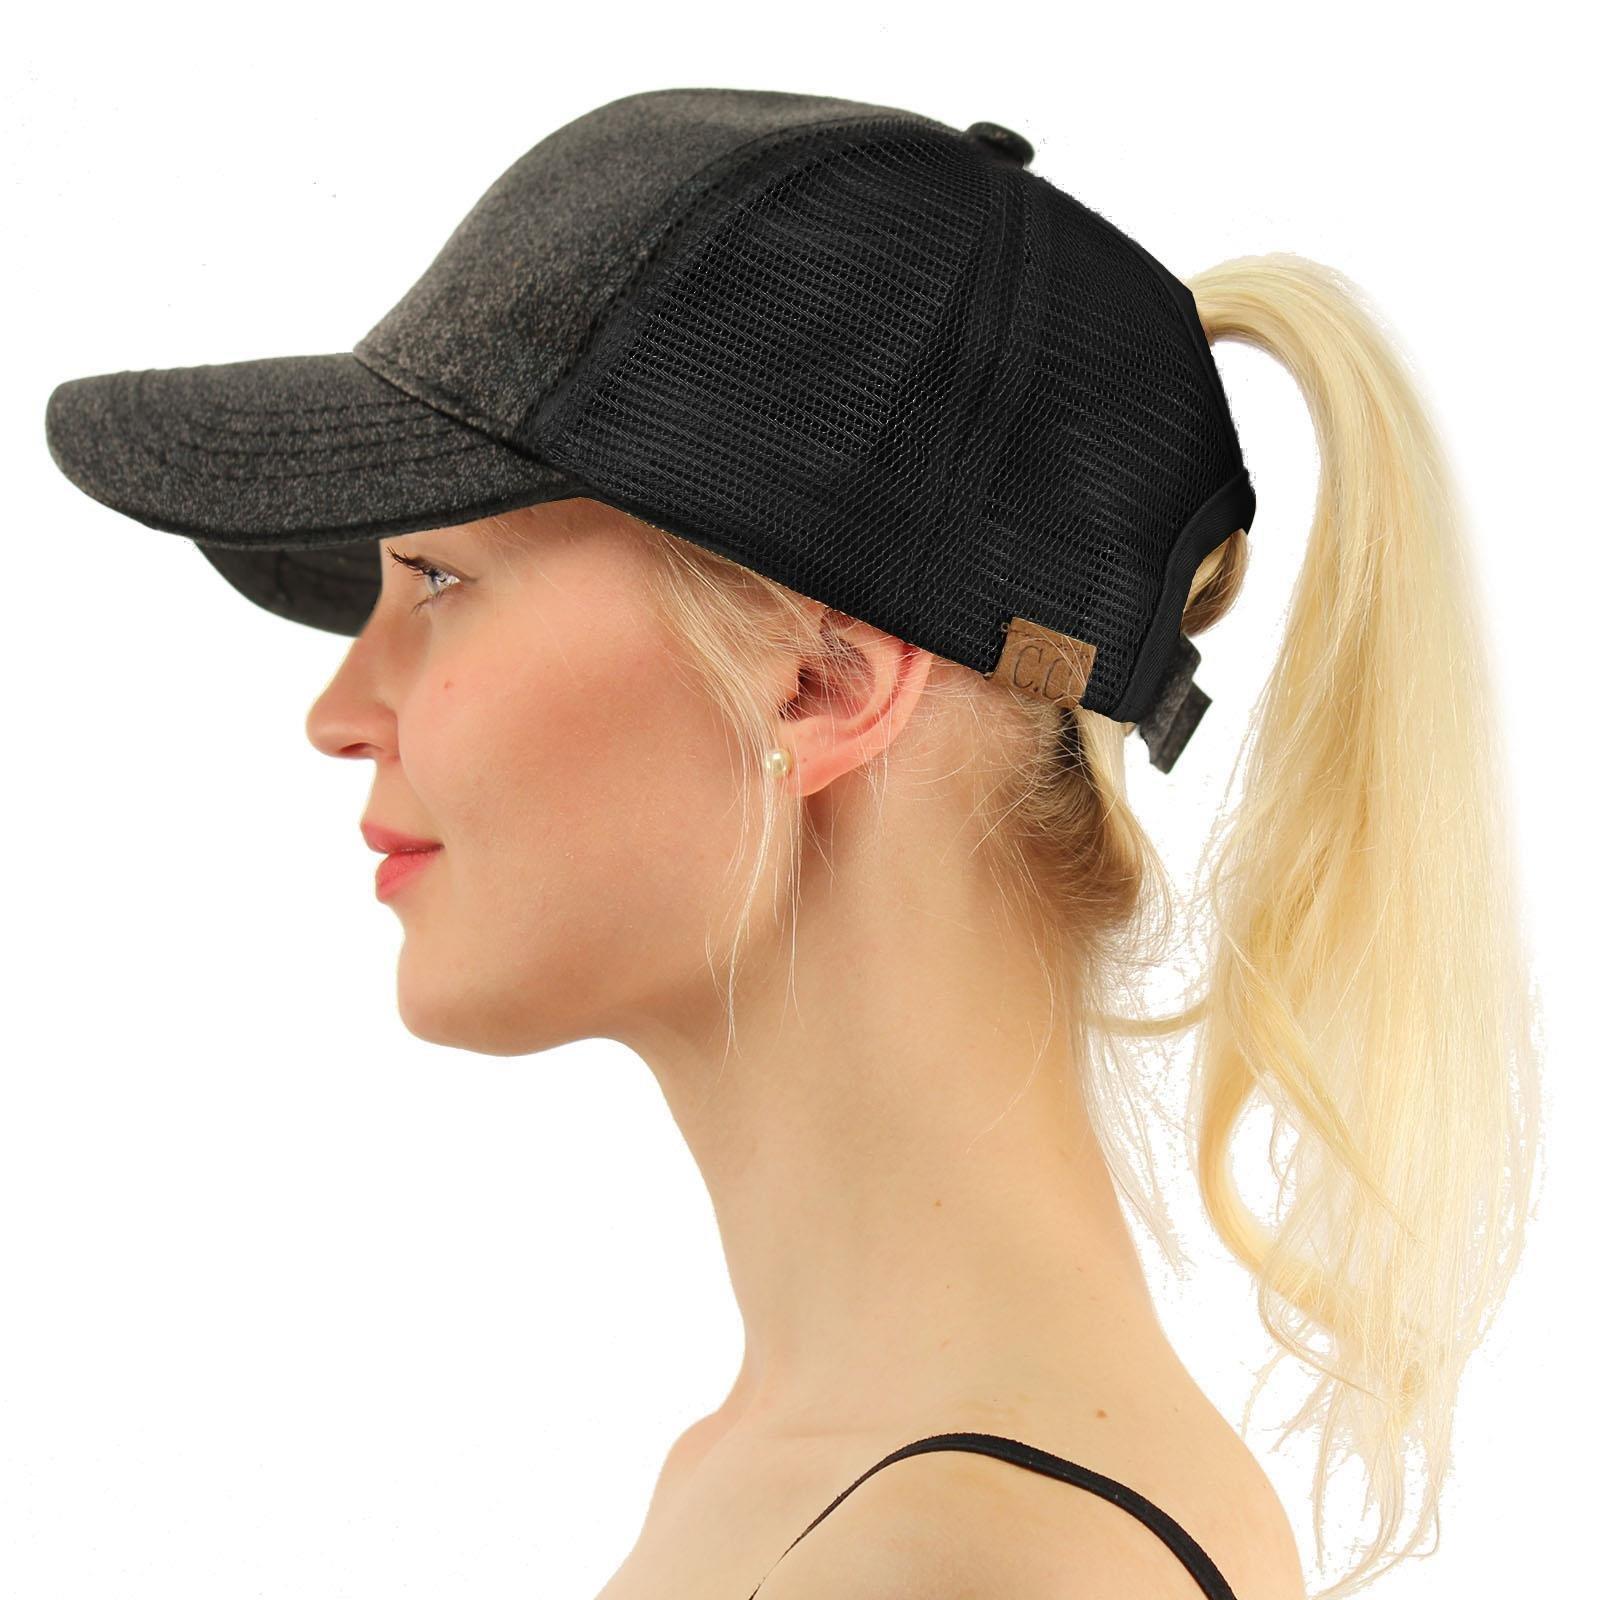 C.C Ponytail Messy Buns Trucker Ponycaps Plain Baseball Visor Cap Dad Hat Glitter Black